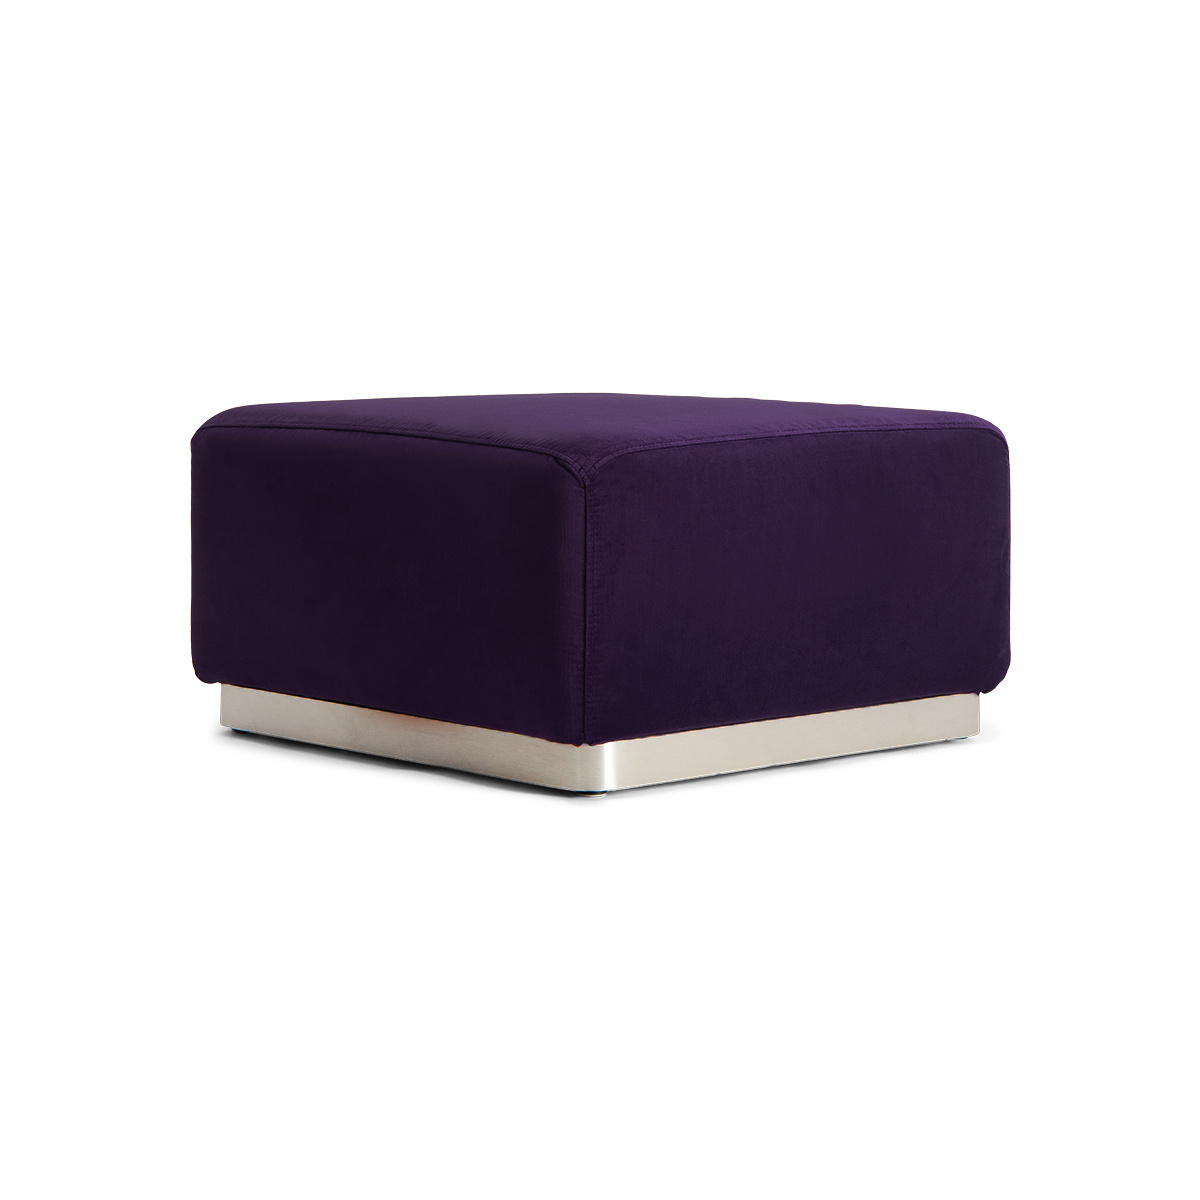 Rotondo Footstool in Plum Velvet